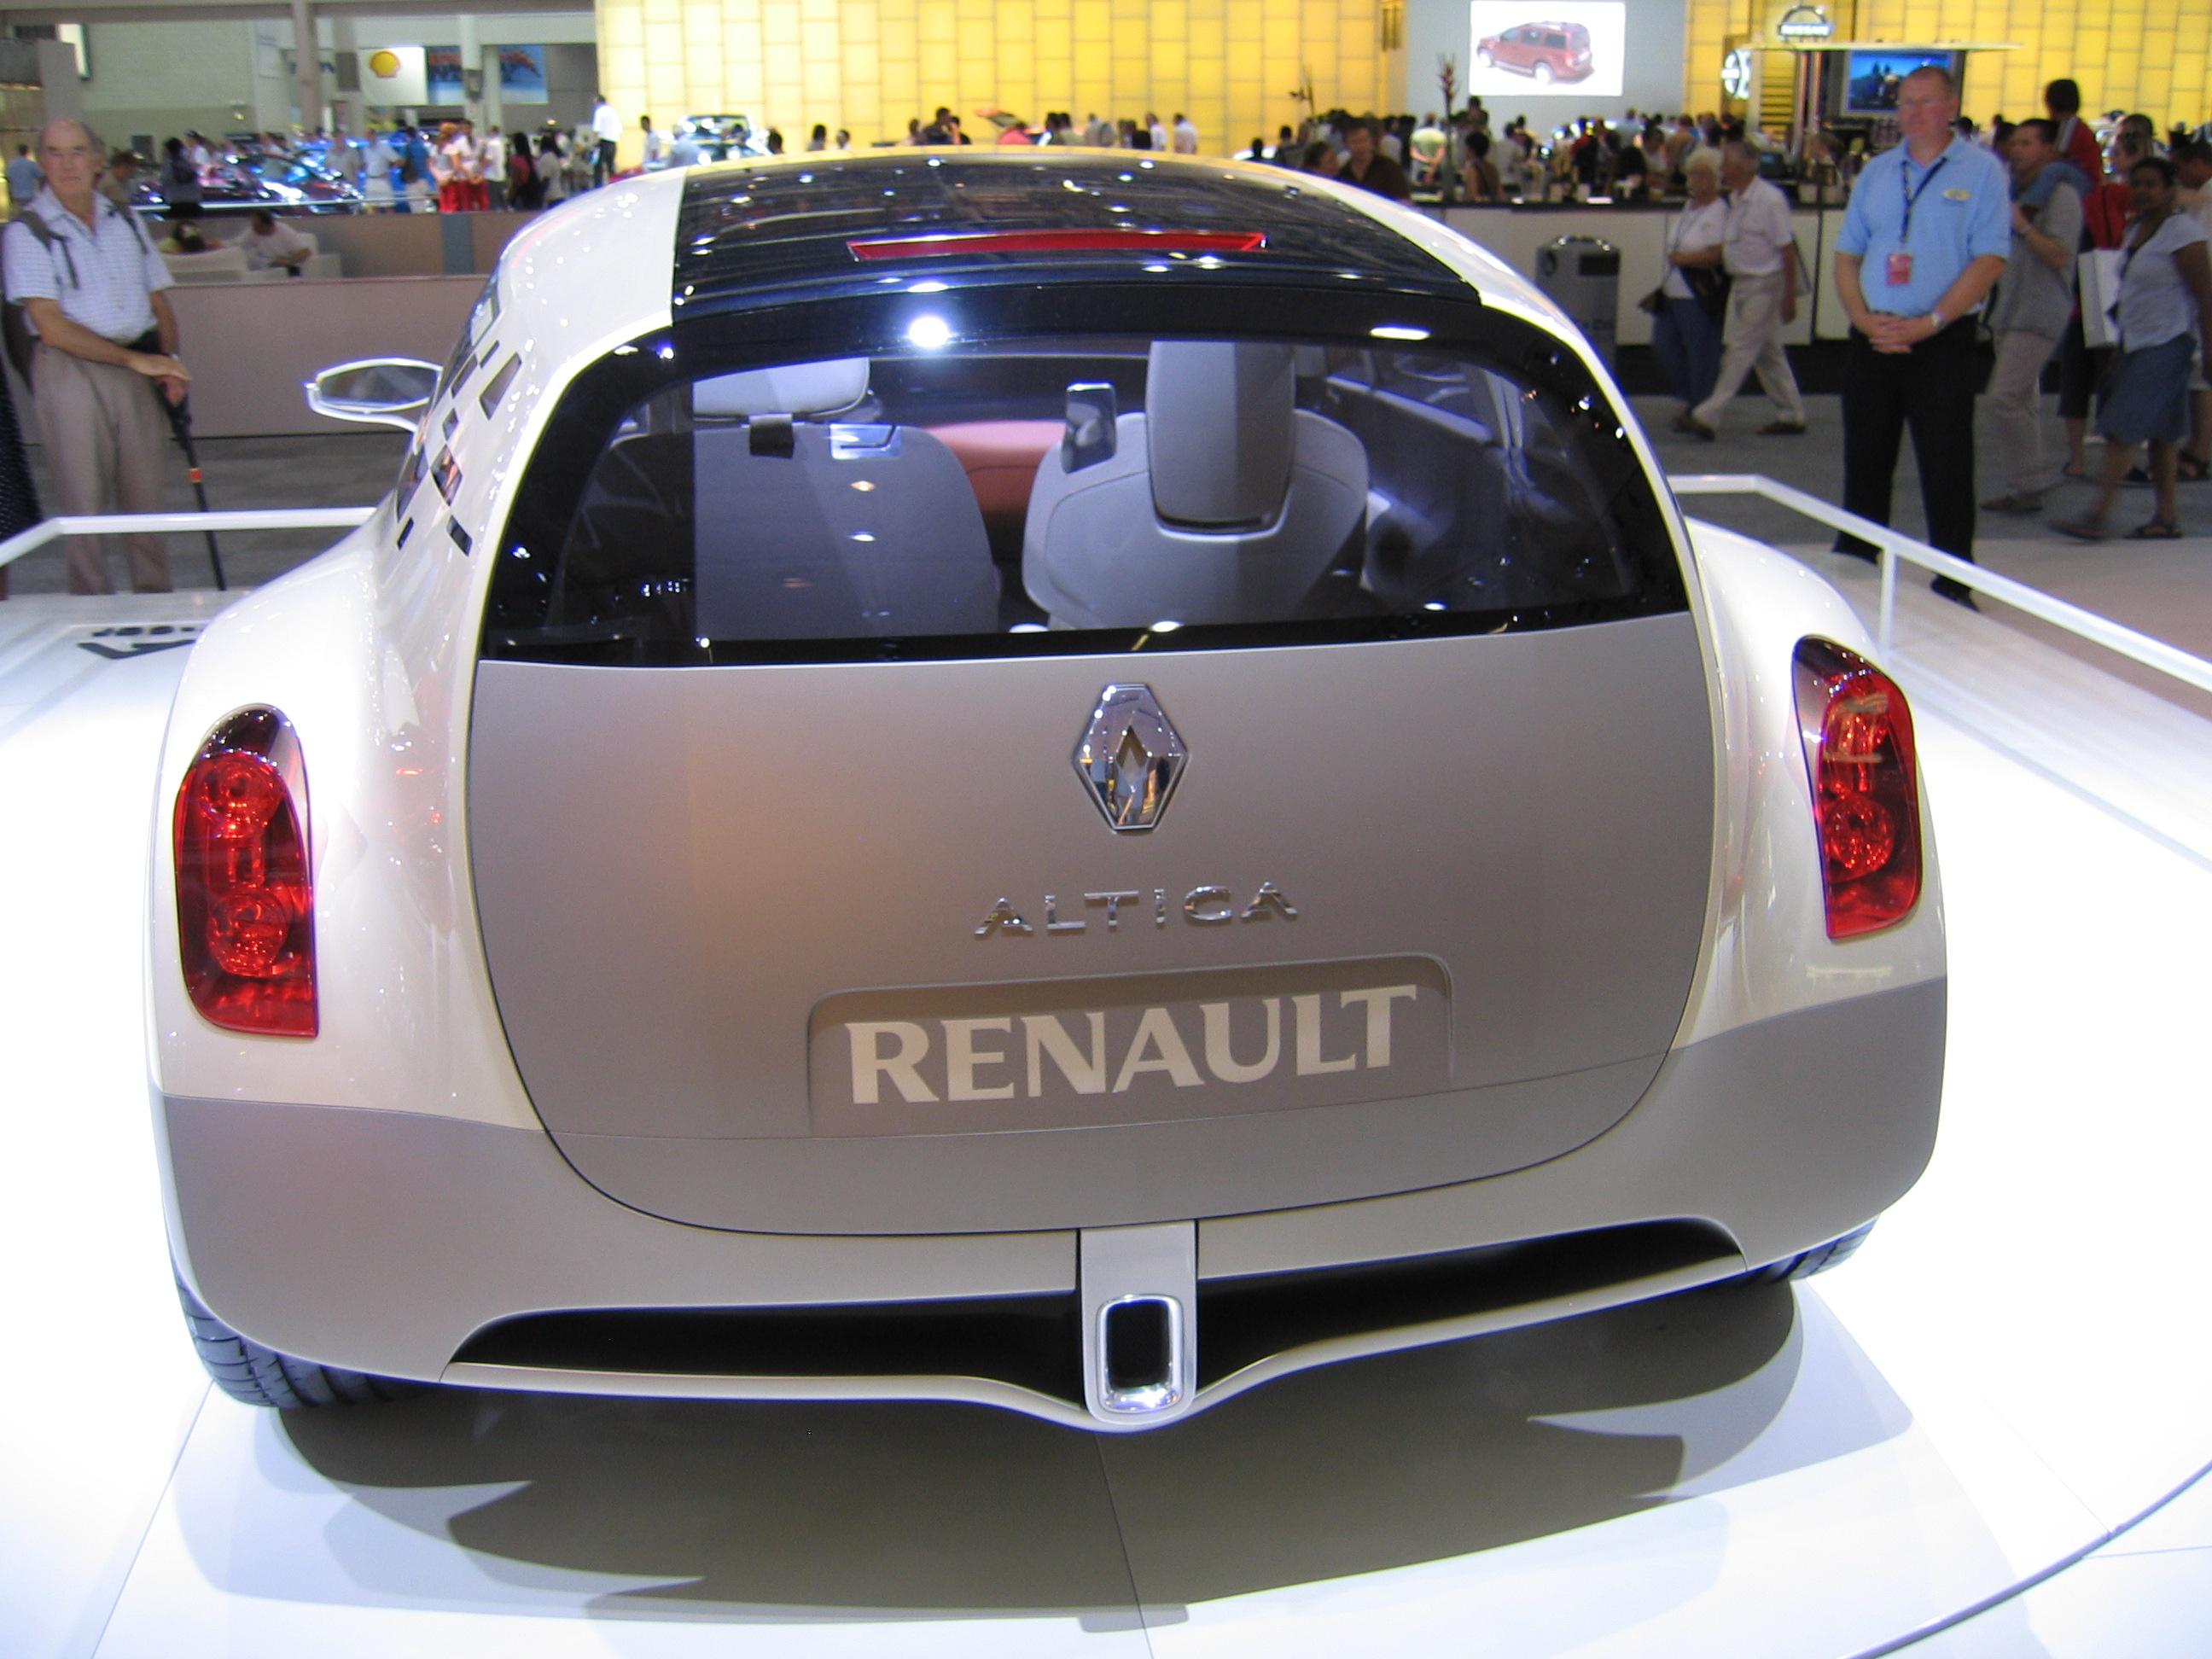 file renault altica concept car flickr wikimedia commons. Black Bedroom Furniture Sets. Home Design Ideas